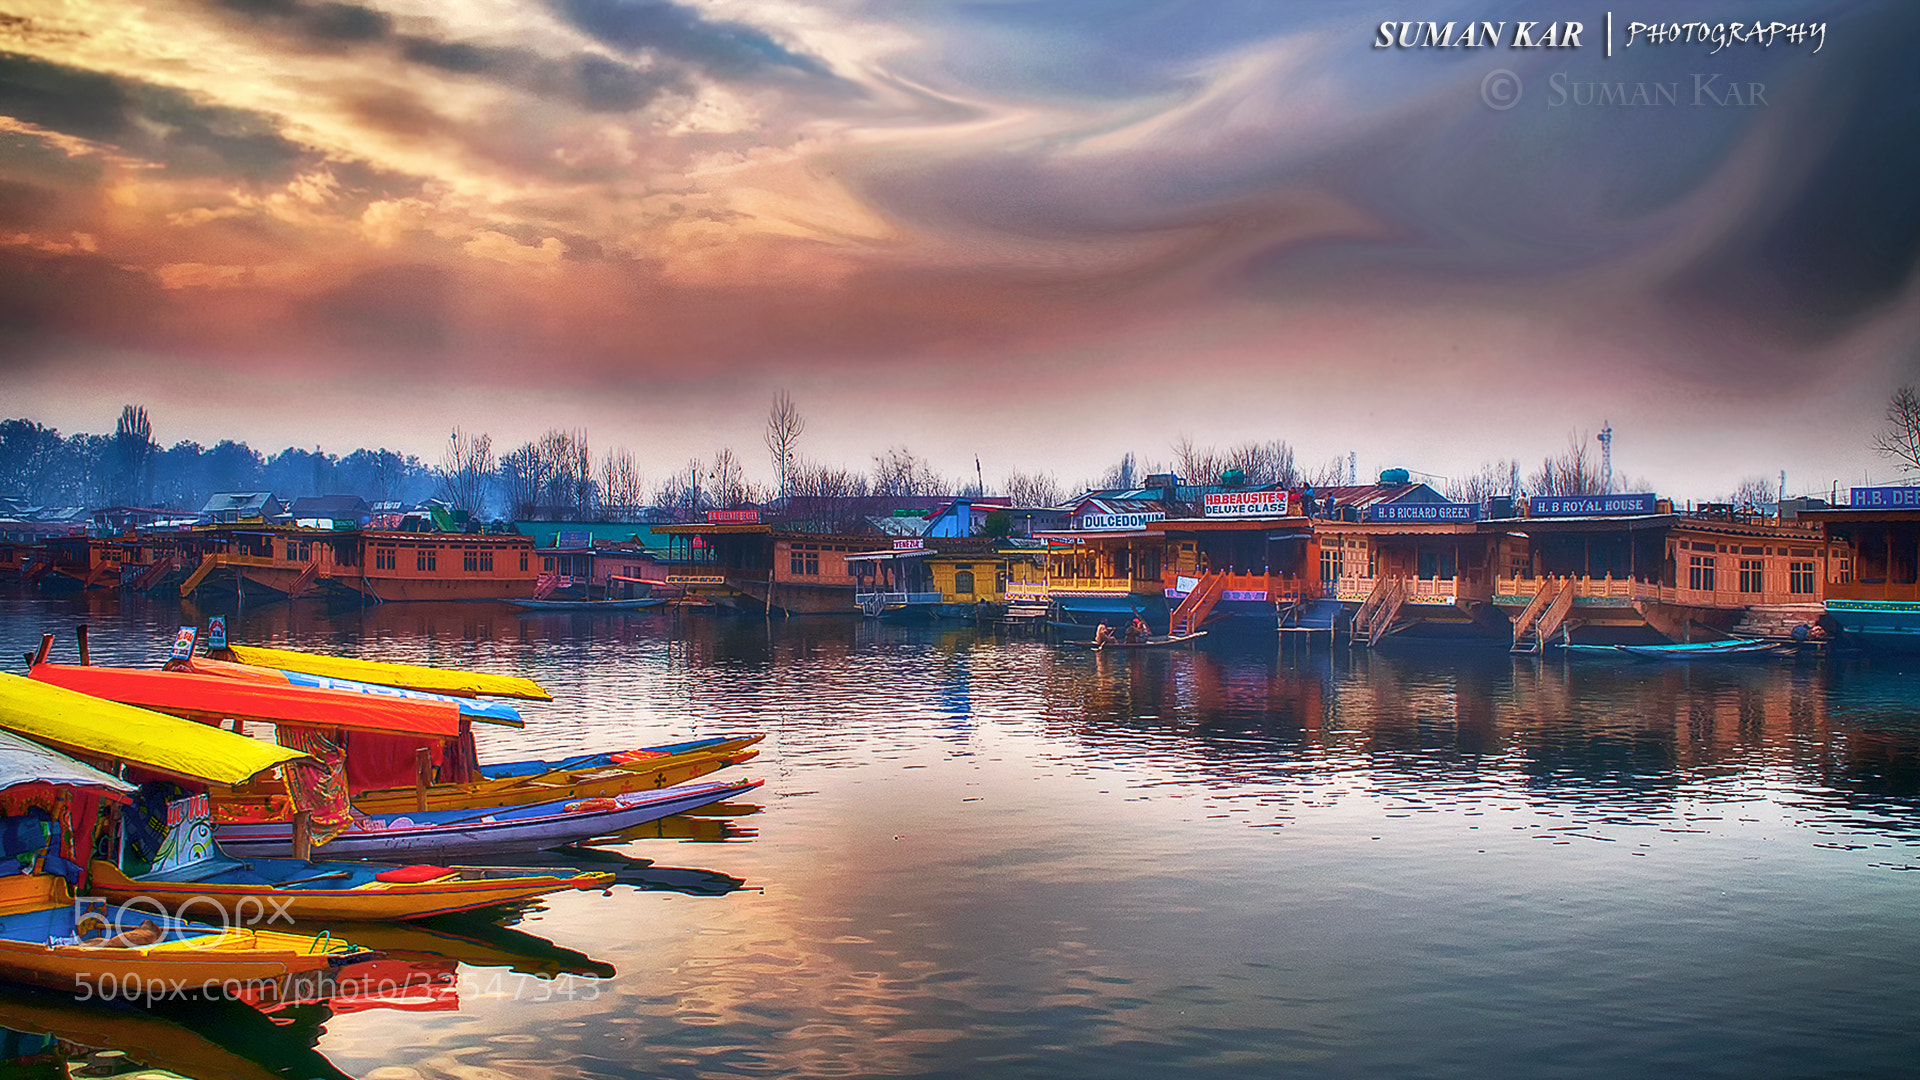 Photograph Fantasy by Suman Kar on 500px